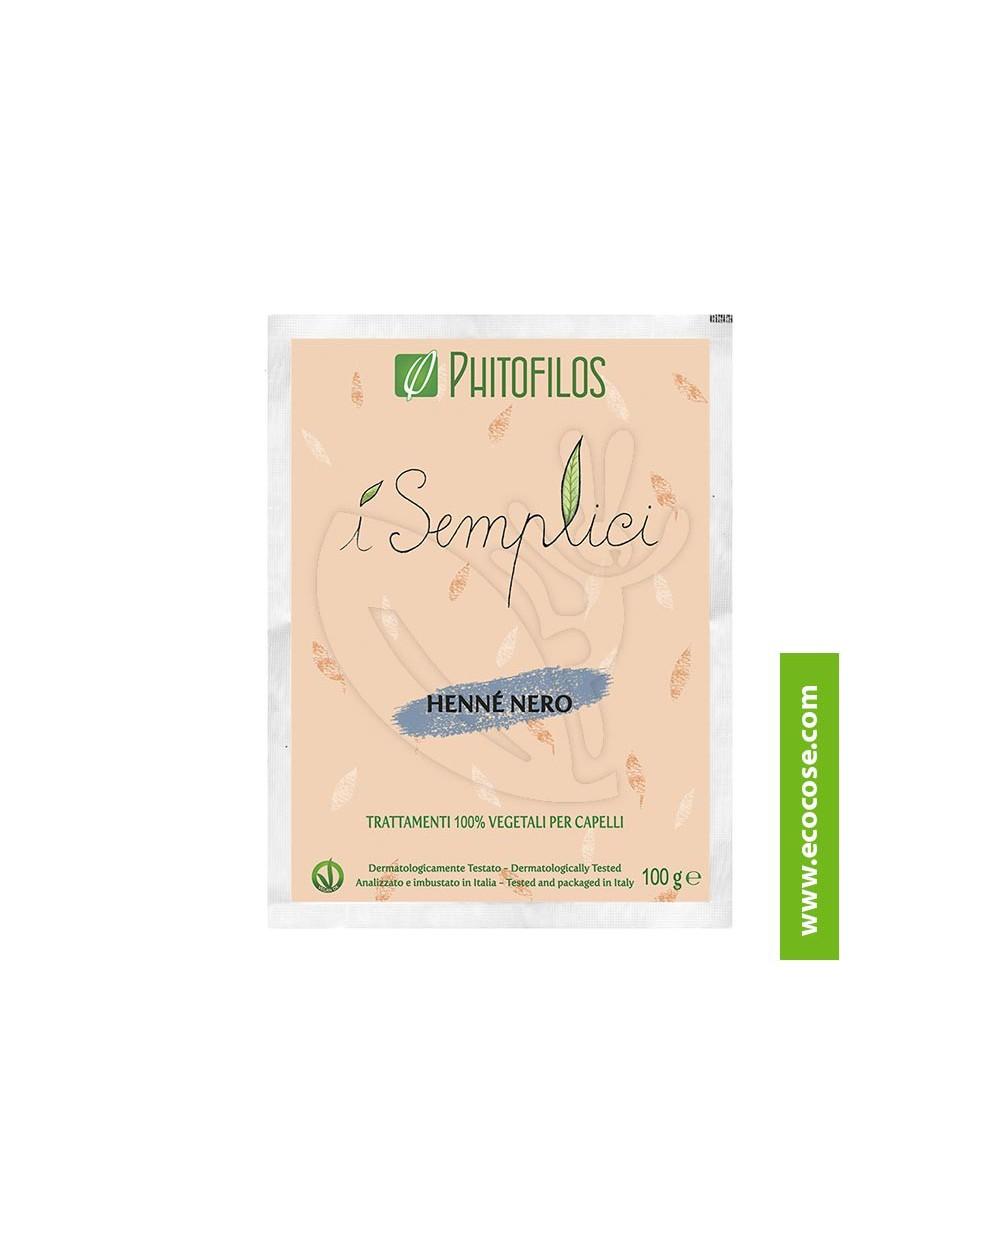 Phitofilos - I semplici - Henné Nero (Indigo)